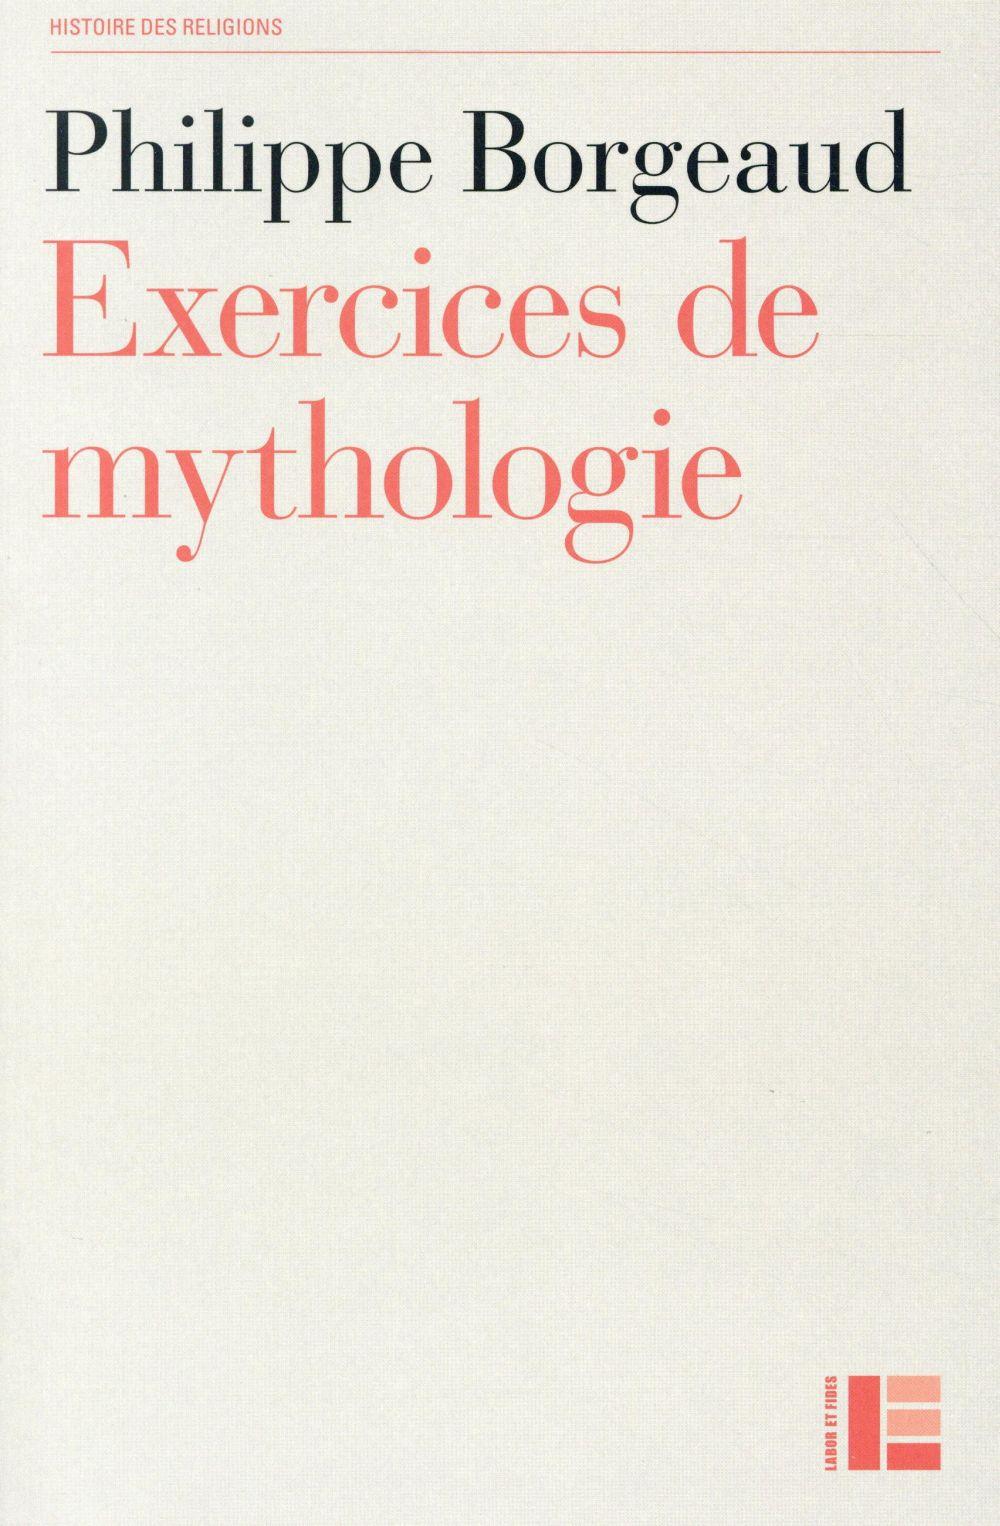 EXERCICES DE MYTHOLOGIE PHILIP